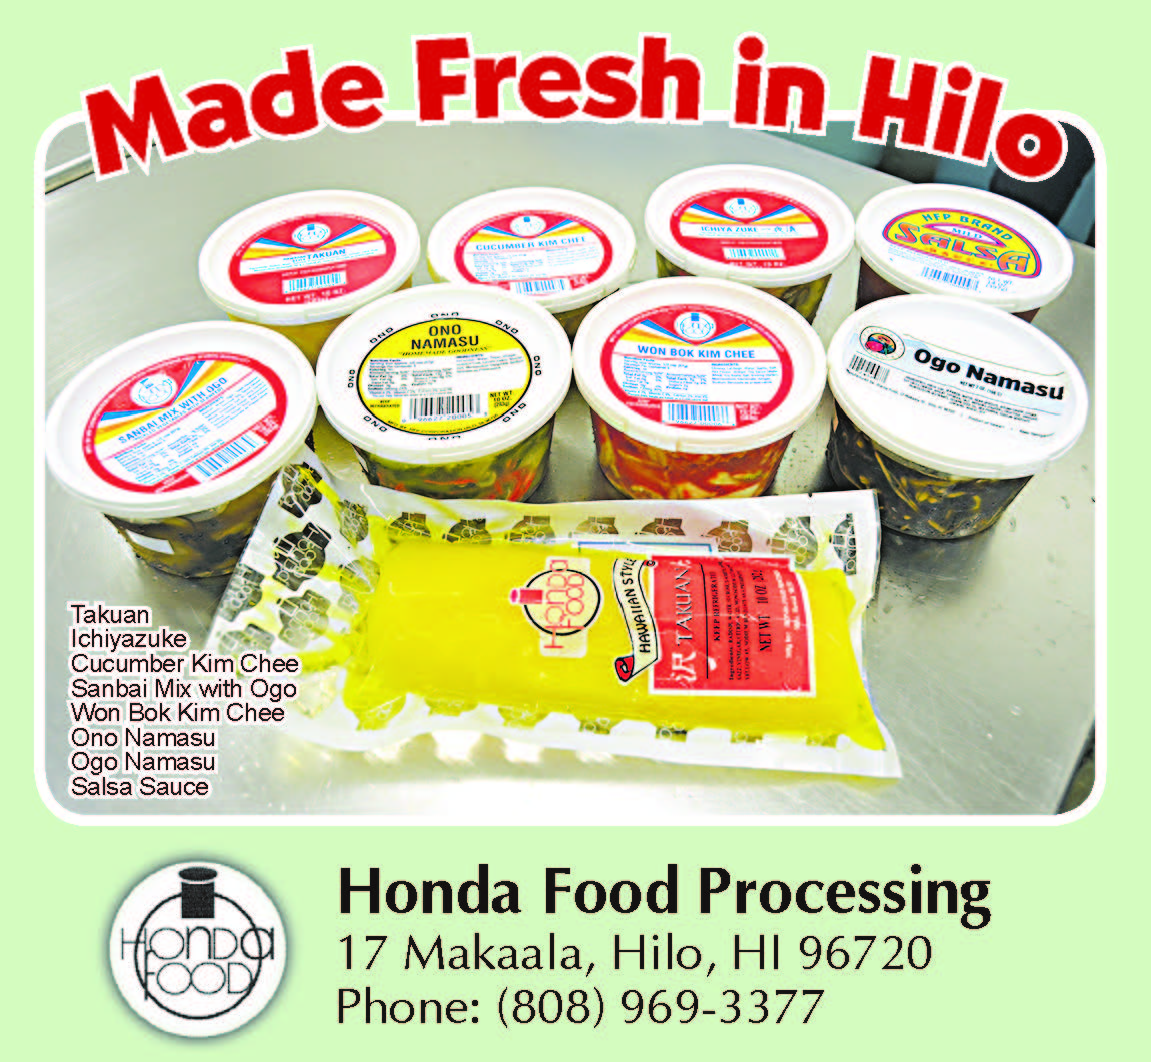 Honda Food Processing Ad